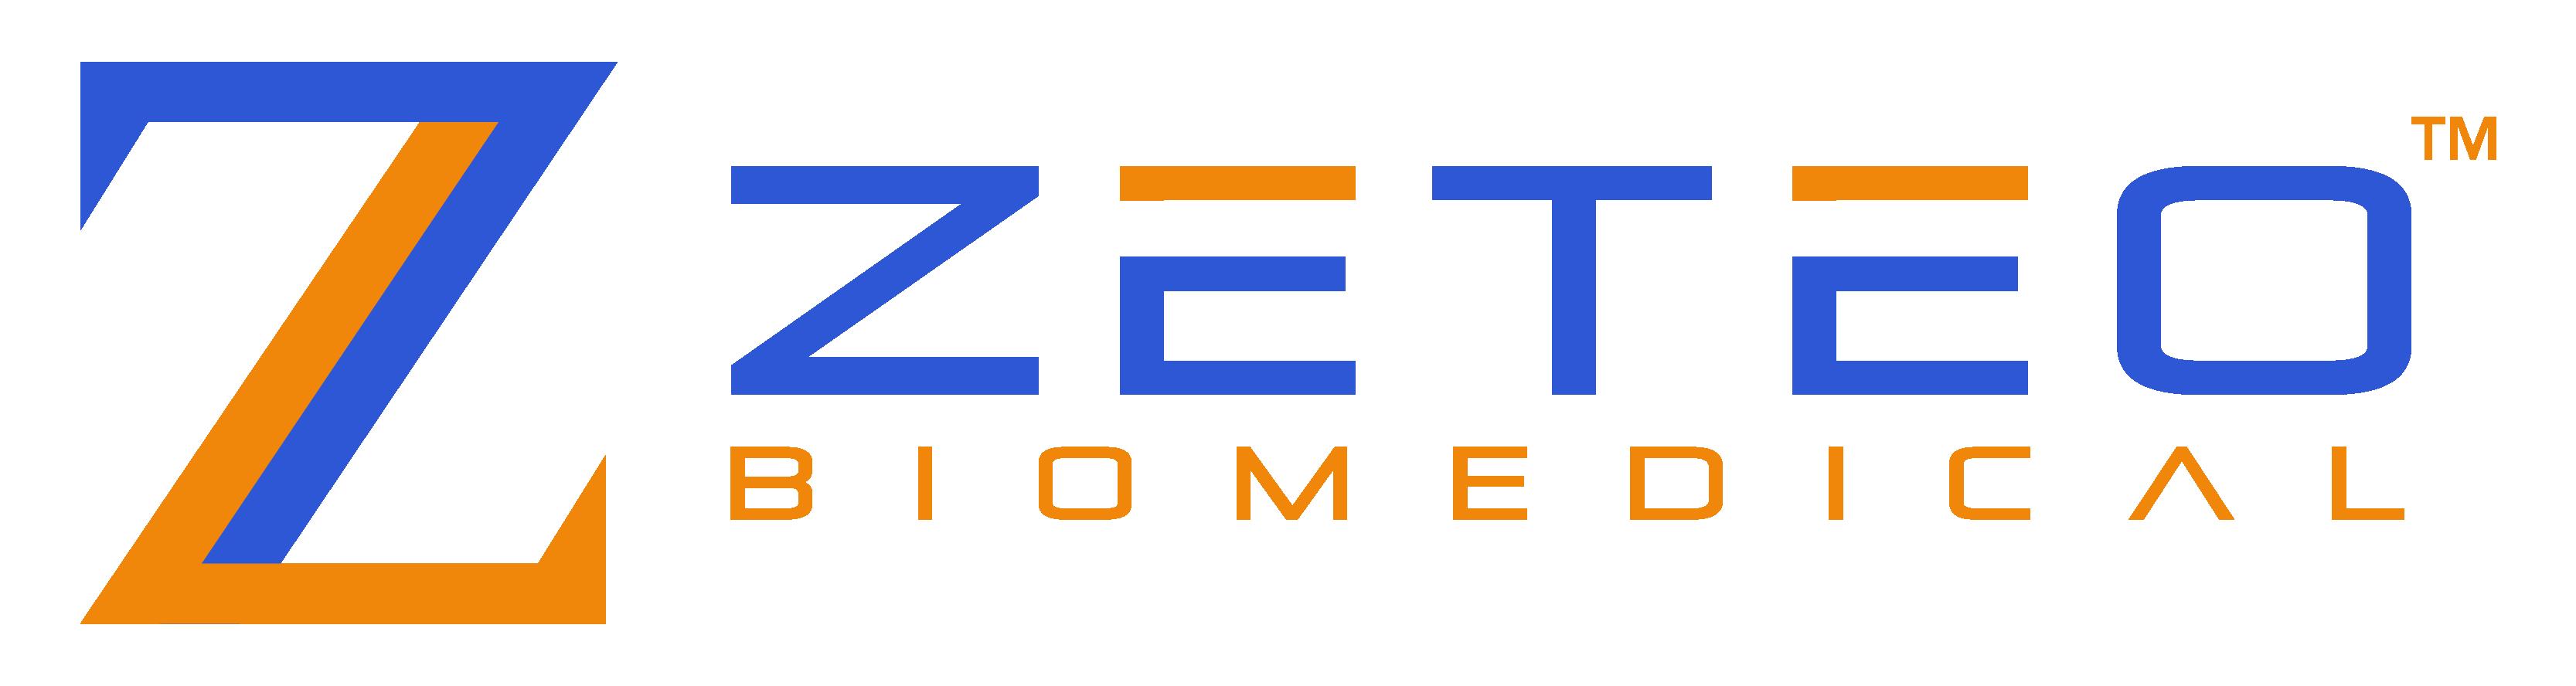 Zeteo Biomedical Receives NIH Award to Develop a Universal Nasal Flu Vaccine in Collaboration with the Iowa State University Nanovaccine Institute